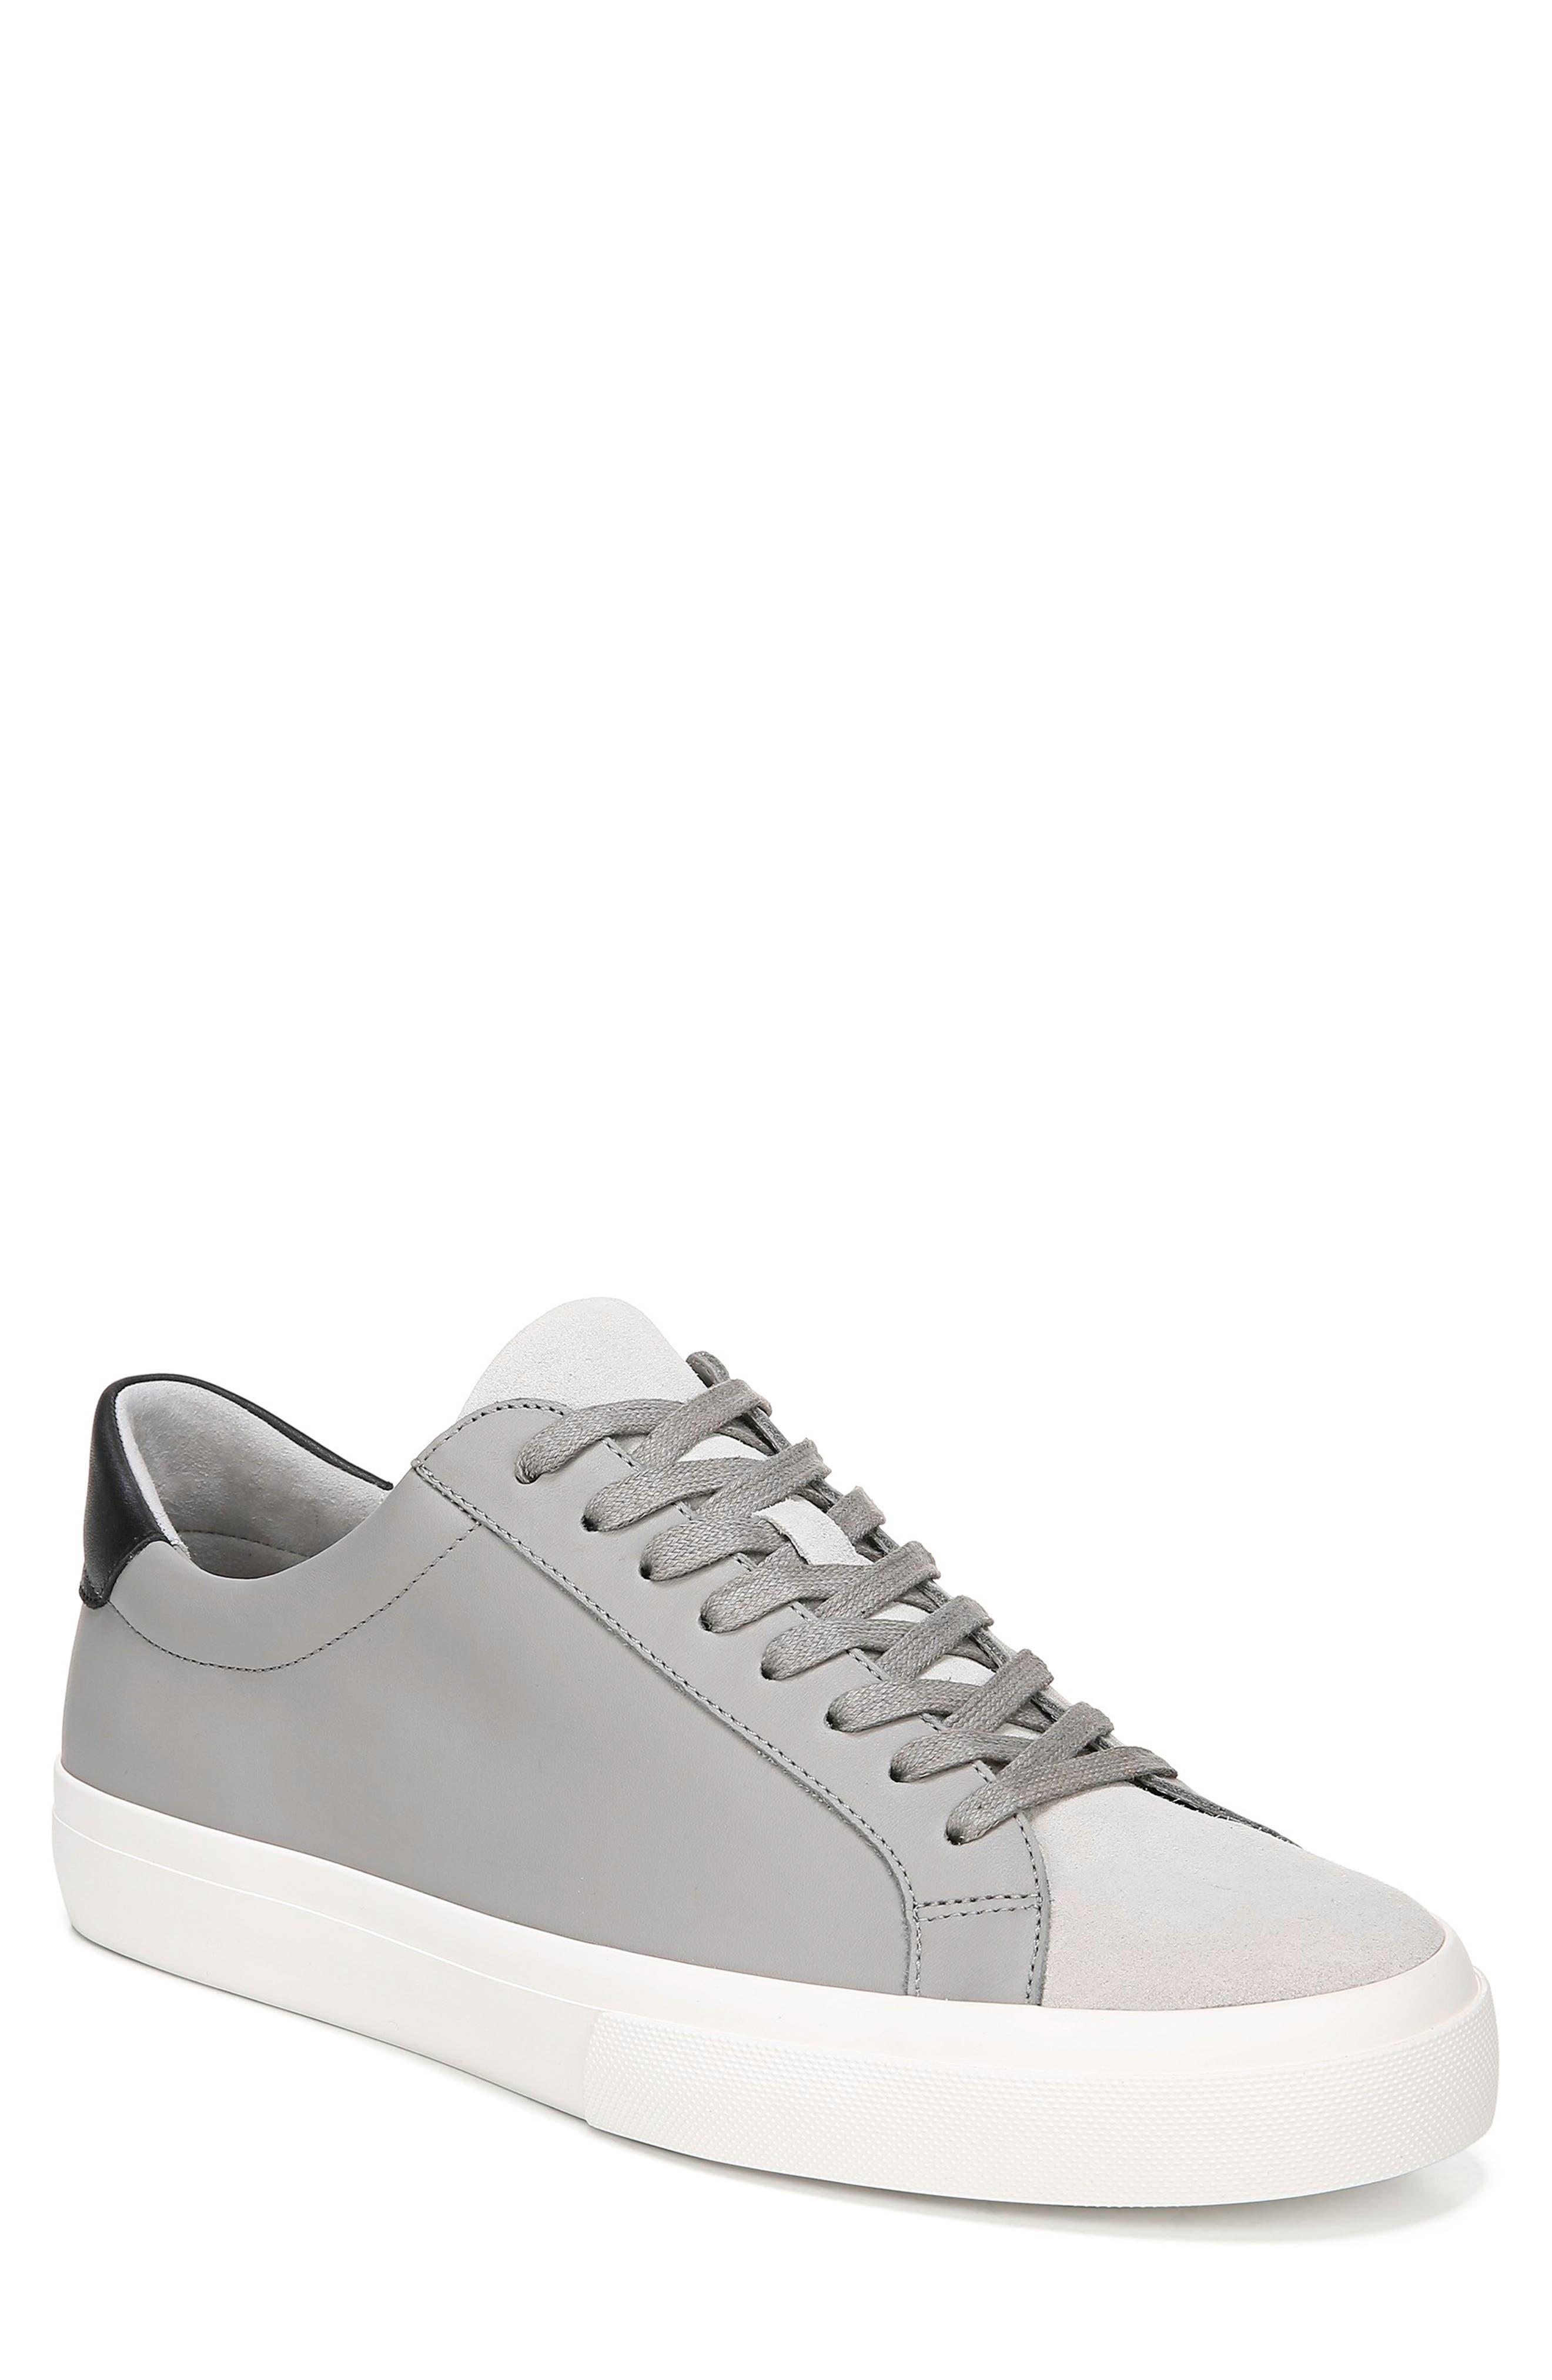 Men's Dress Sneakers, Athletic